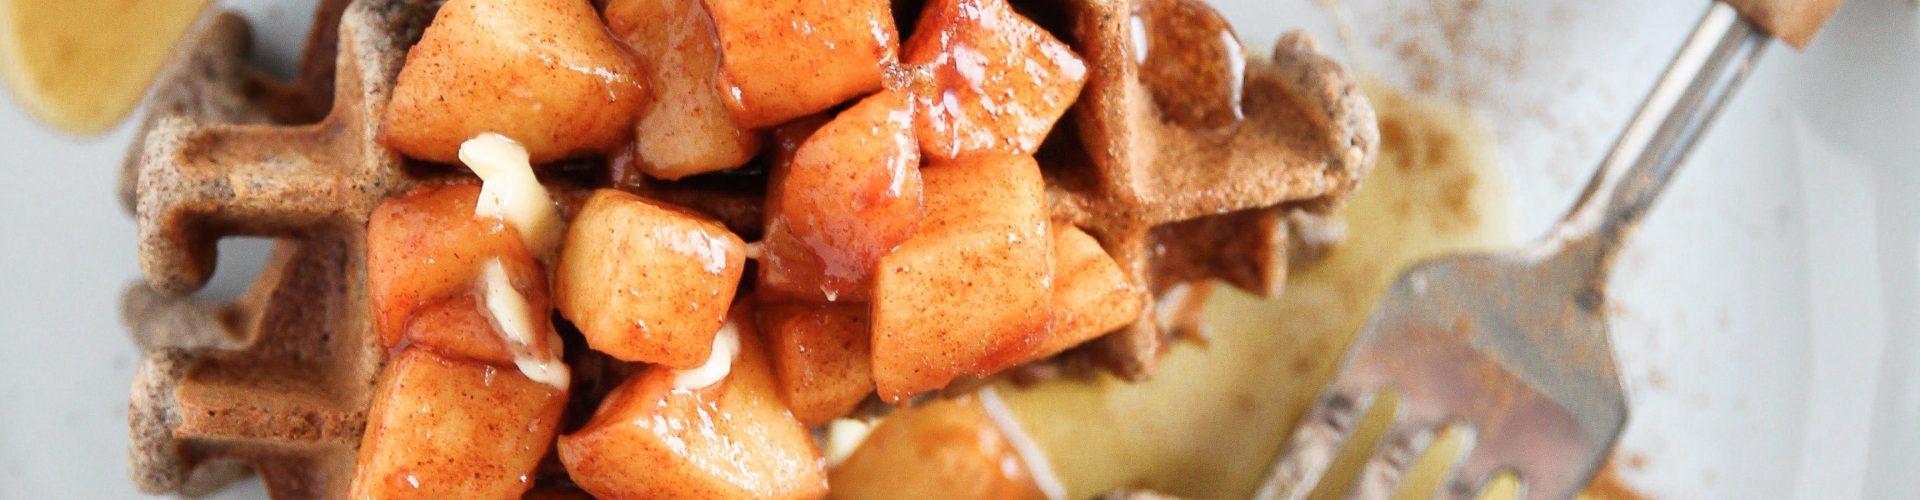 Apple Cider Buckwheat Waffles